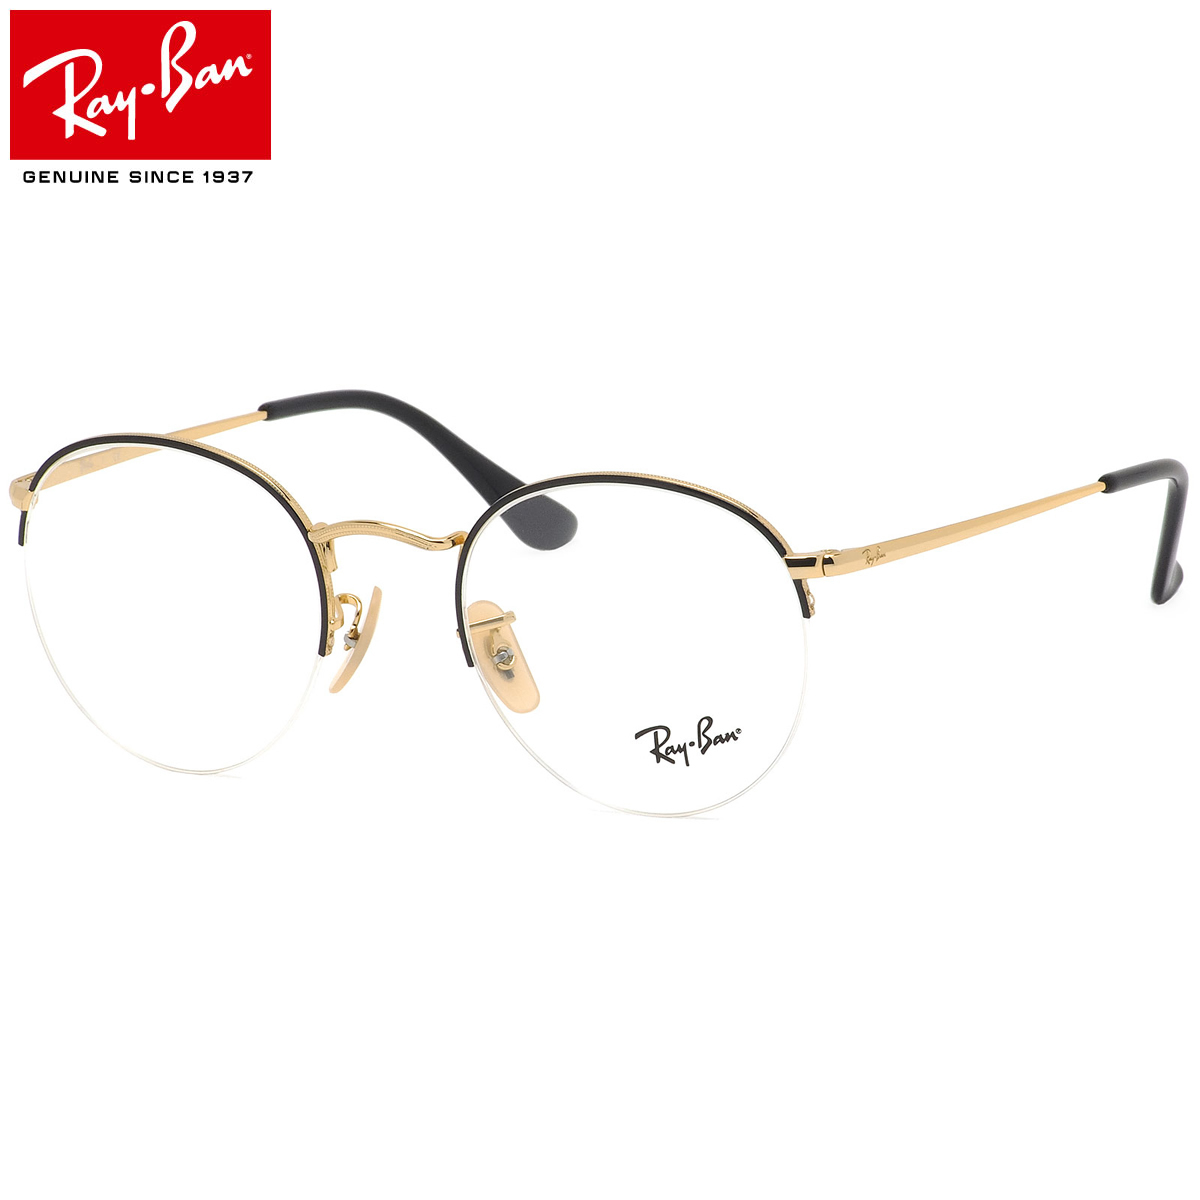 ray ban half rim sunglasses